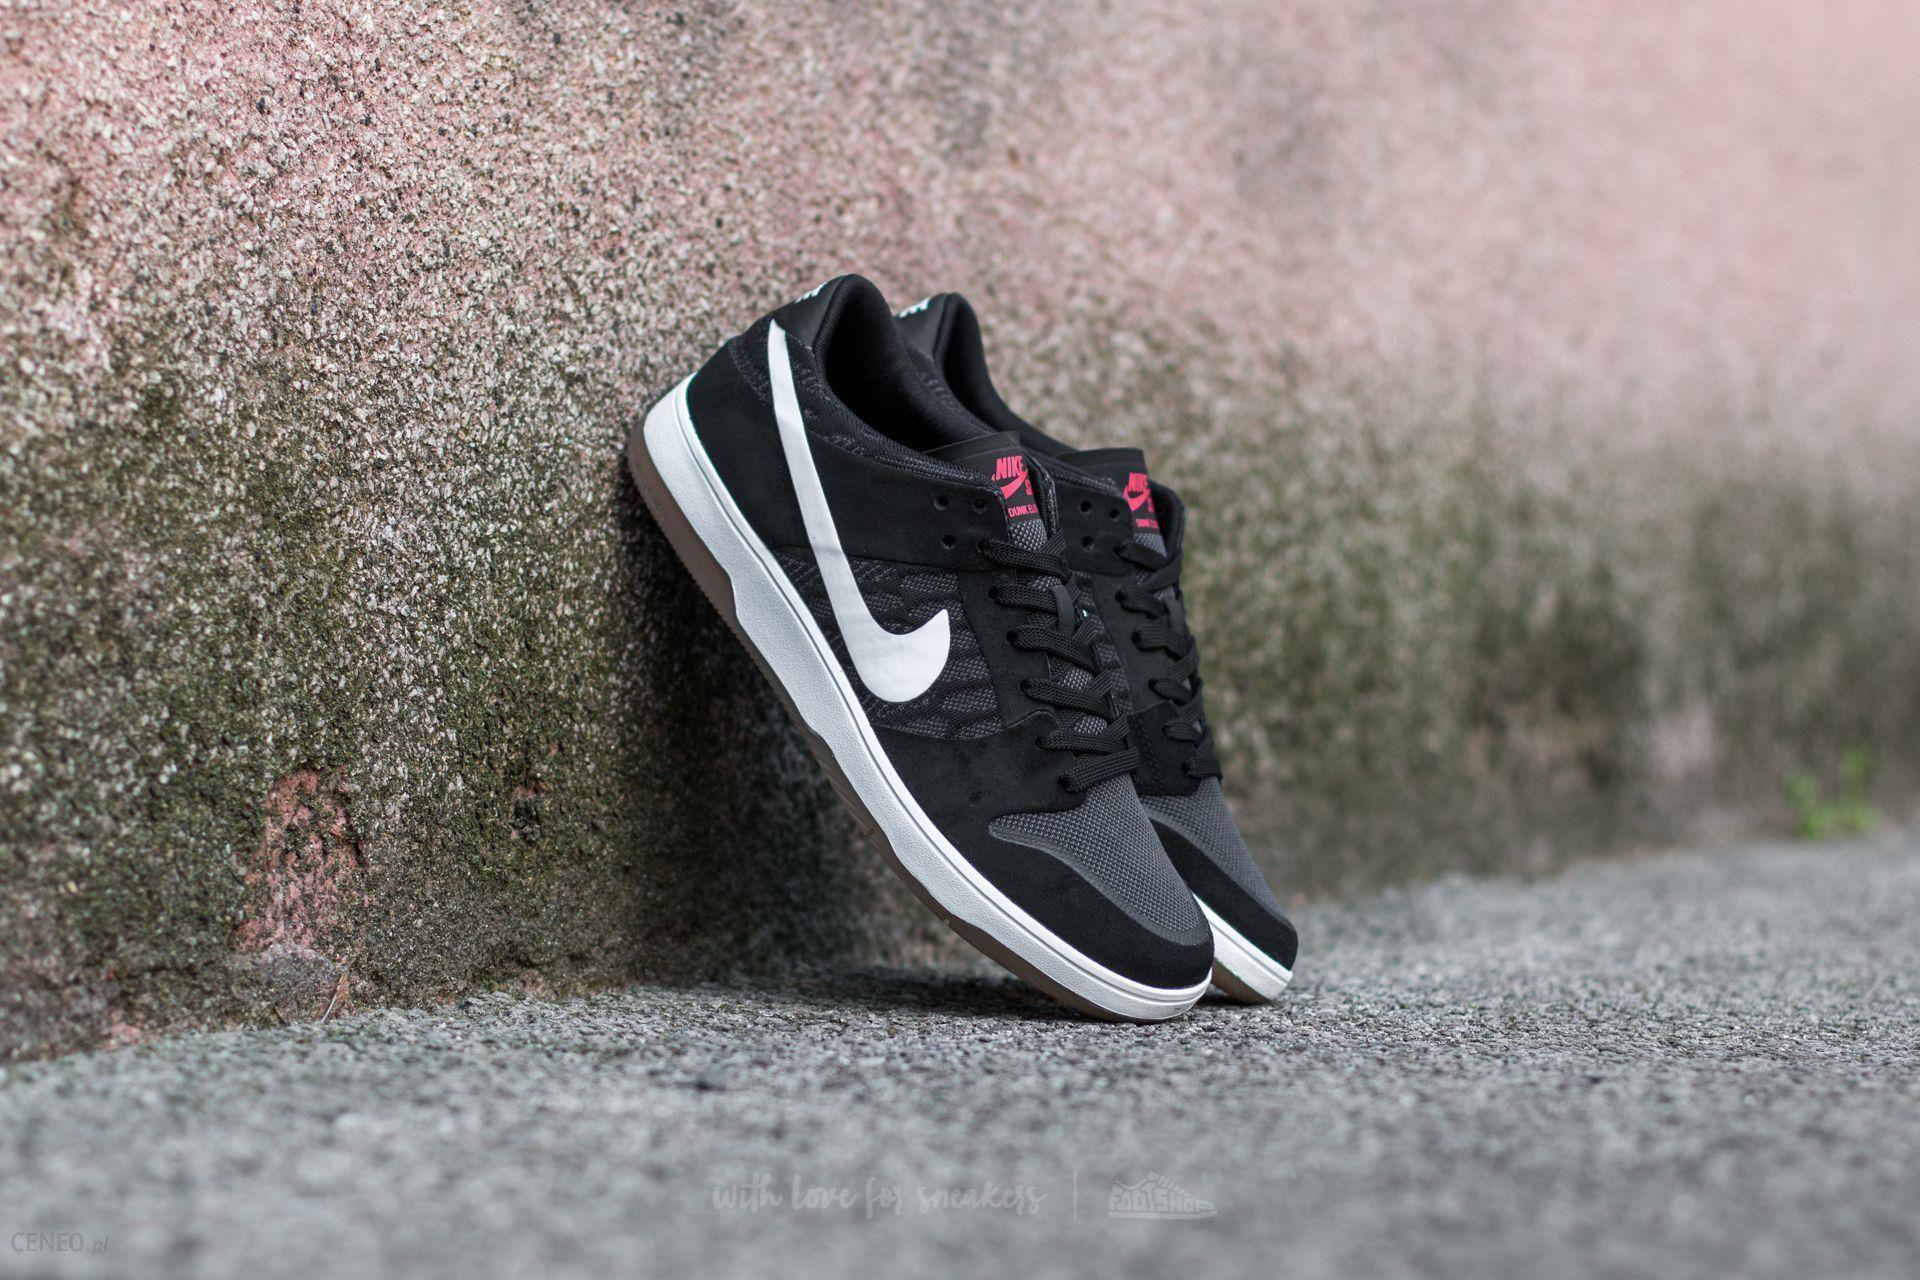 competitive price 54ef4 1742f Nike SB Zoom Dunk Low Elite Black White-Gum Light Brown - zdjęcie 1